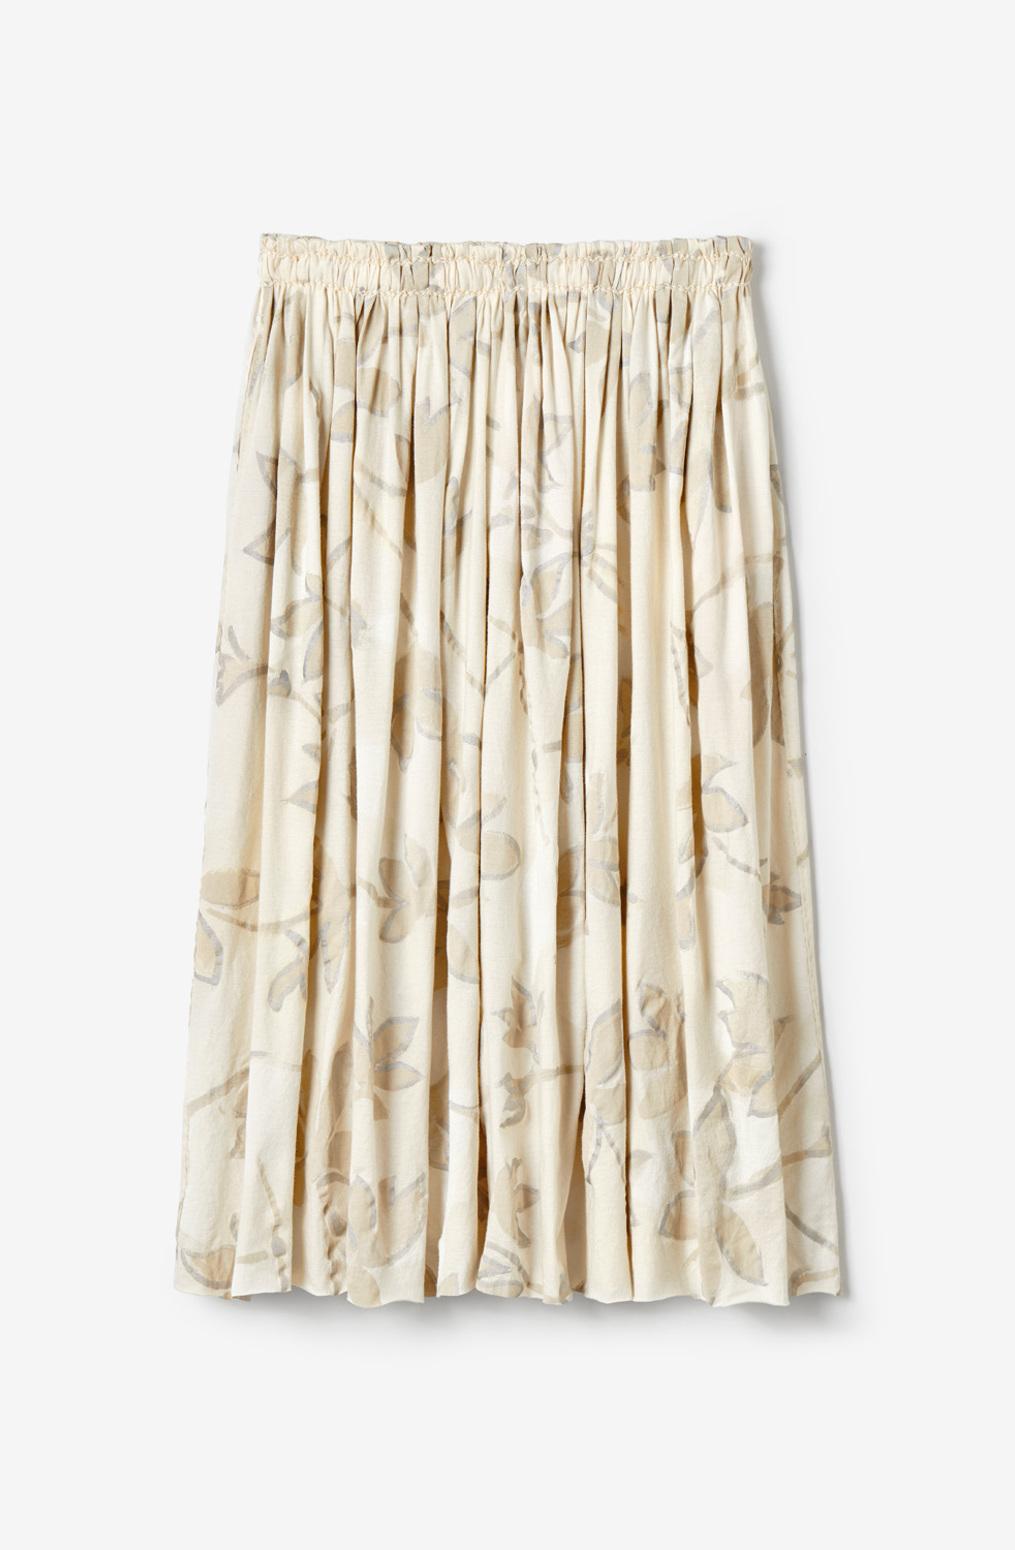 Alabama chanin  organic cotton  lightweight  pleated skirt  hand painted floral pattern